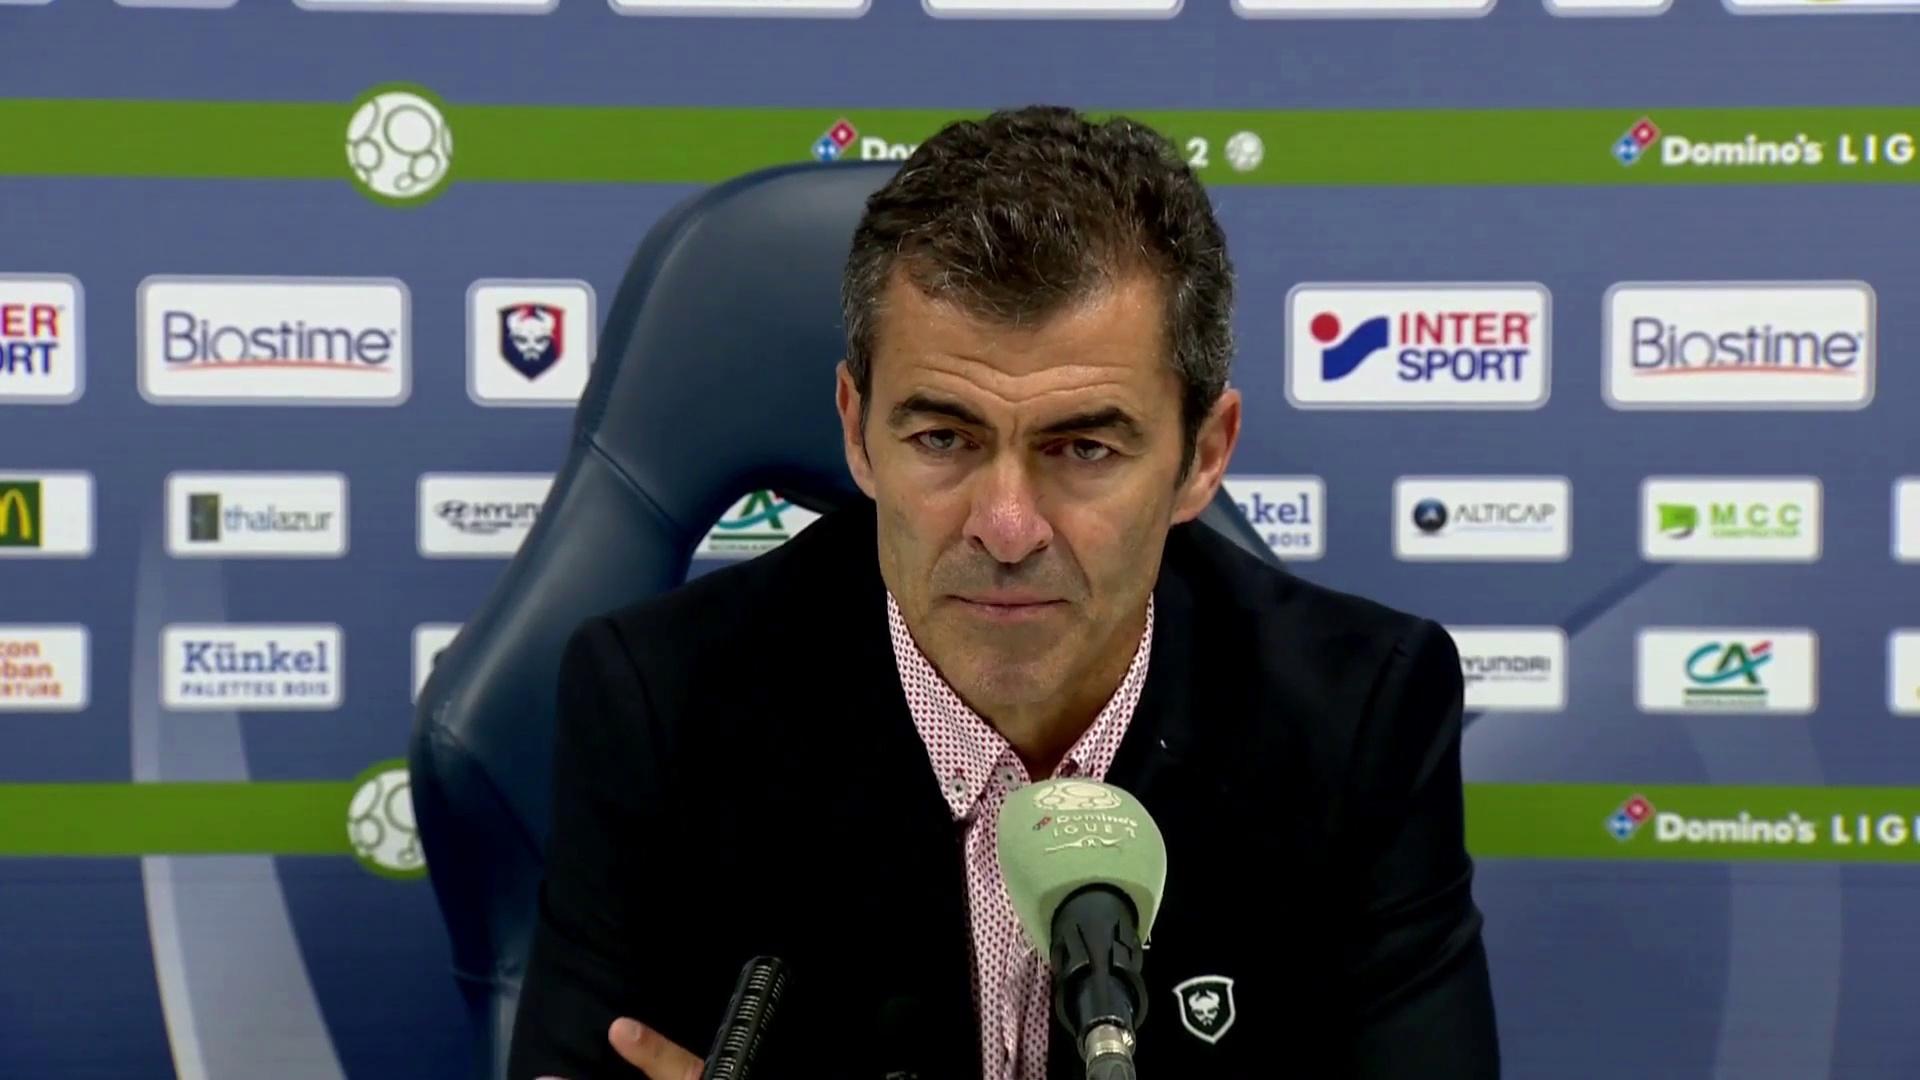 Conférence de presse de Rui Almeida après SMCaen / FC Chambly